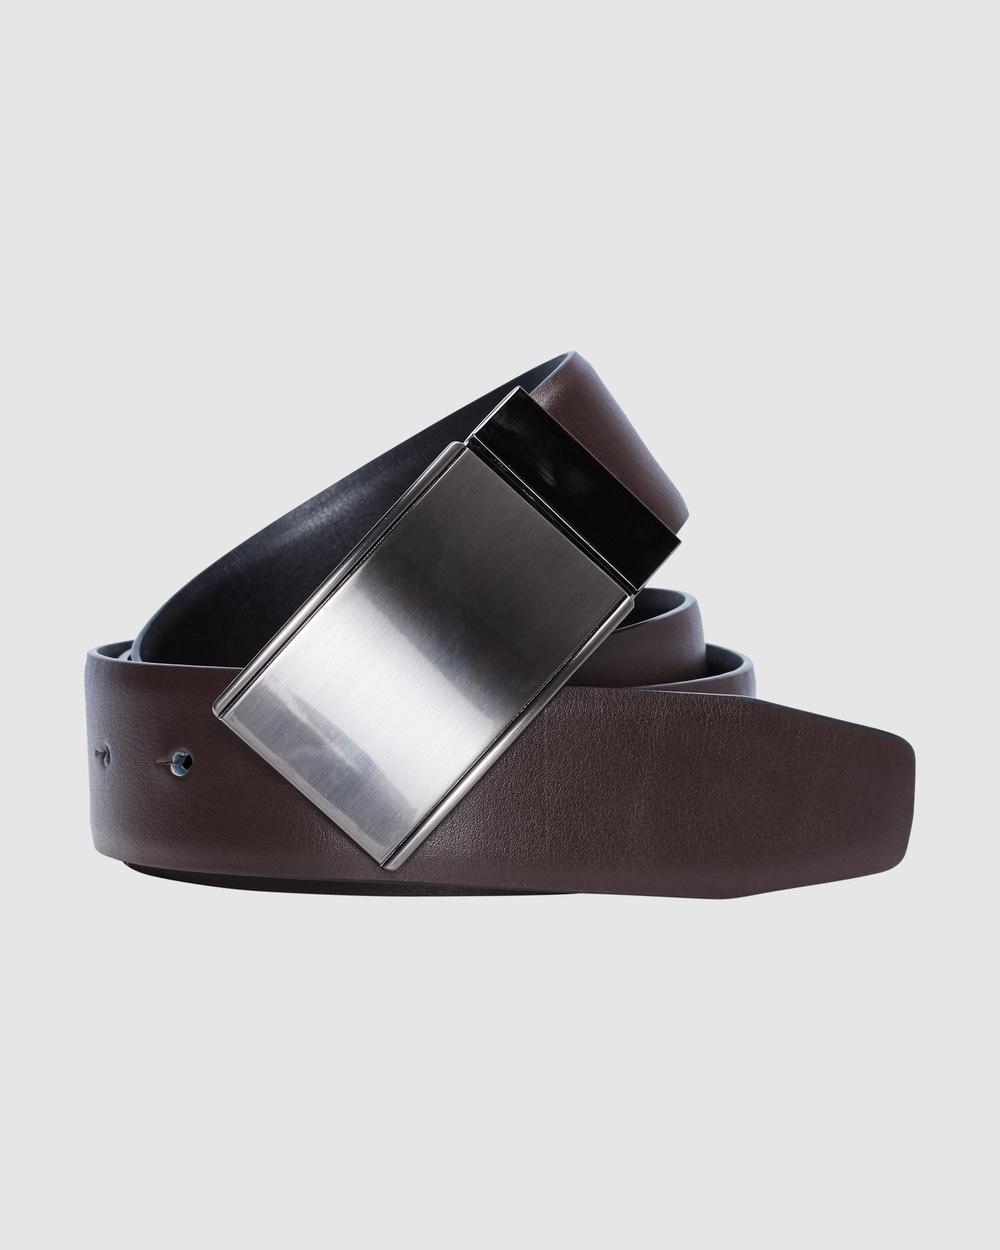 yd. Williams Dress Belt Belts CHOCOLATE